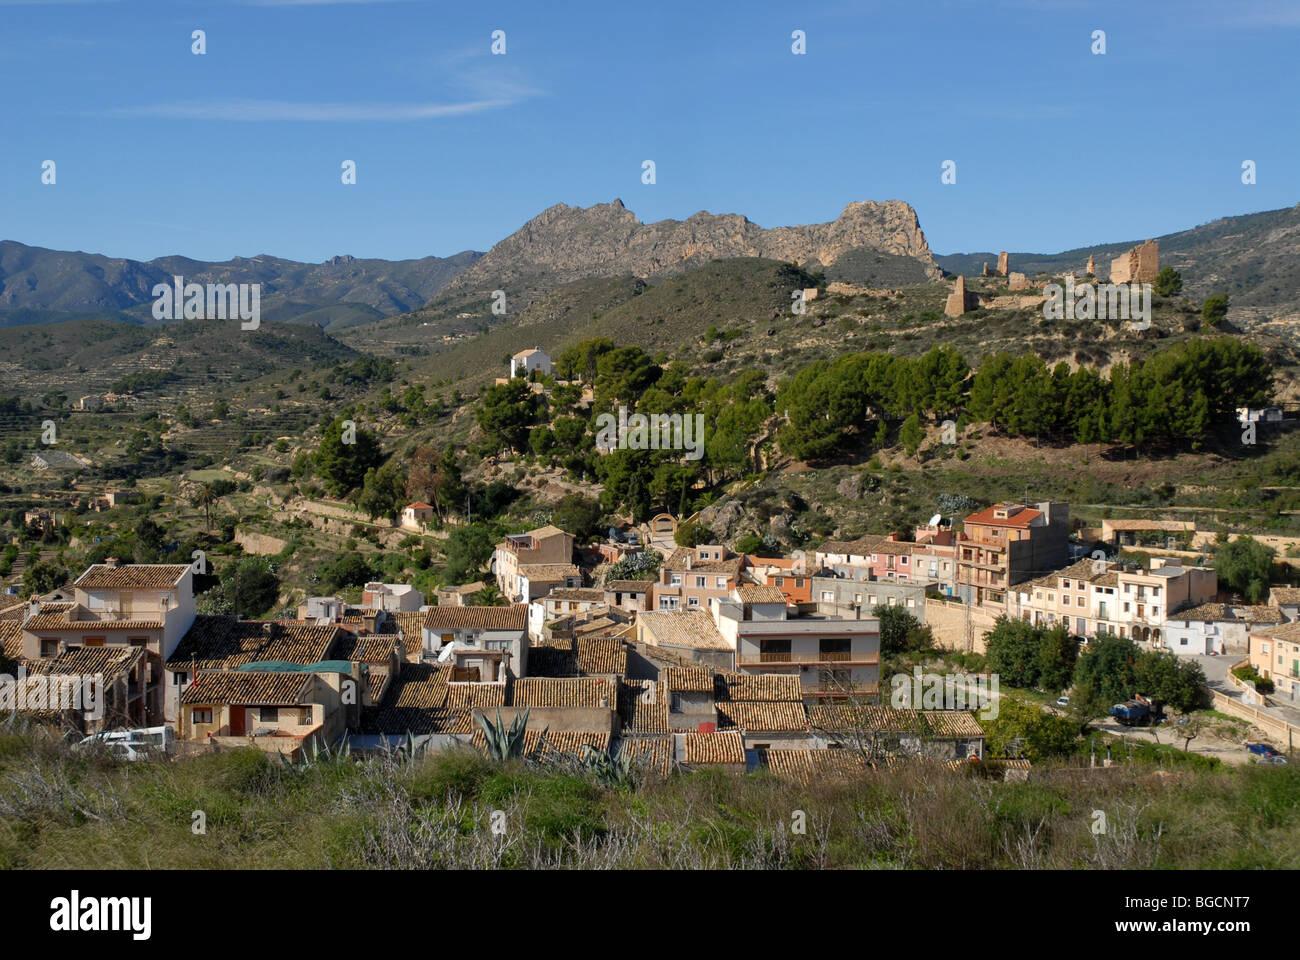 village and ruined castle of Relleu, Alicante Province, Comunidad Valenciana, Spain - Stock Image